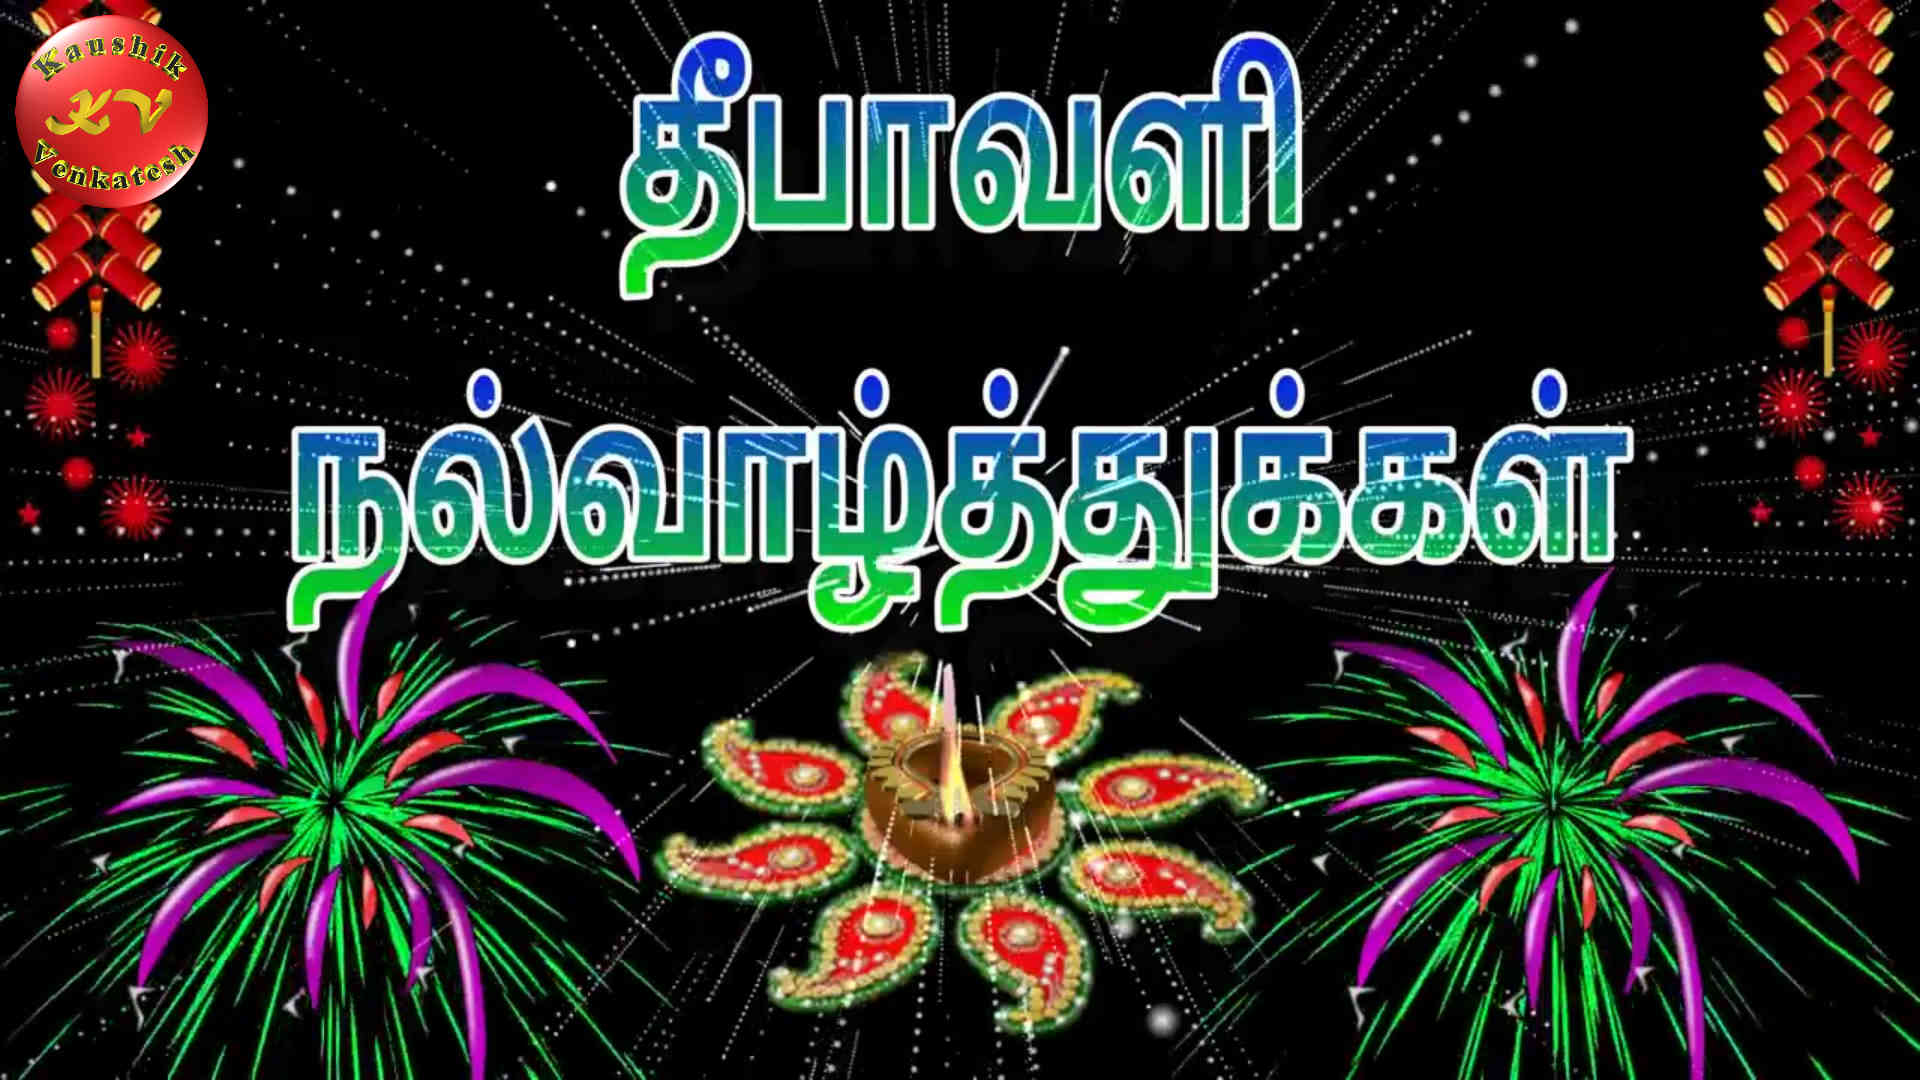 Happy Diwali Images Download in Tamil